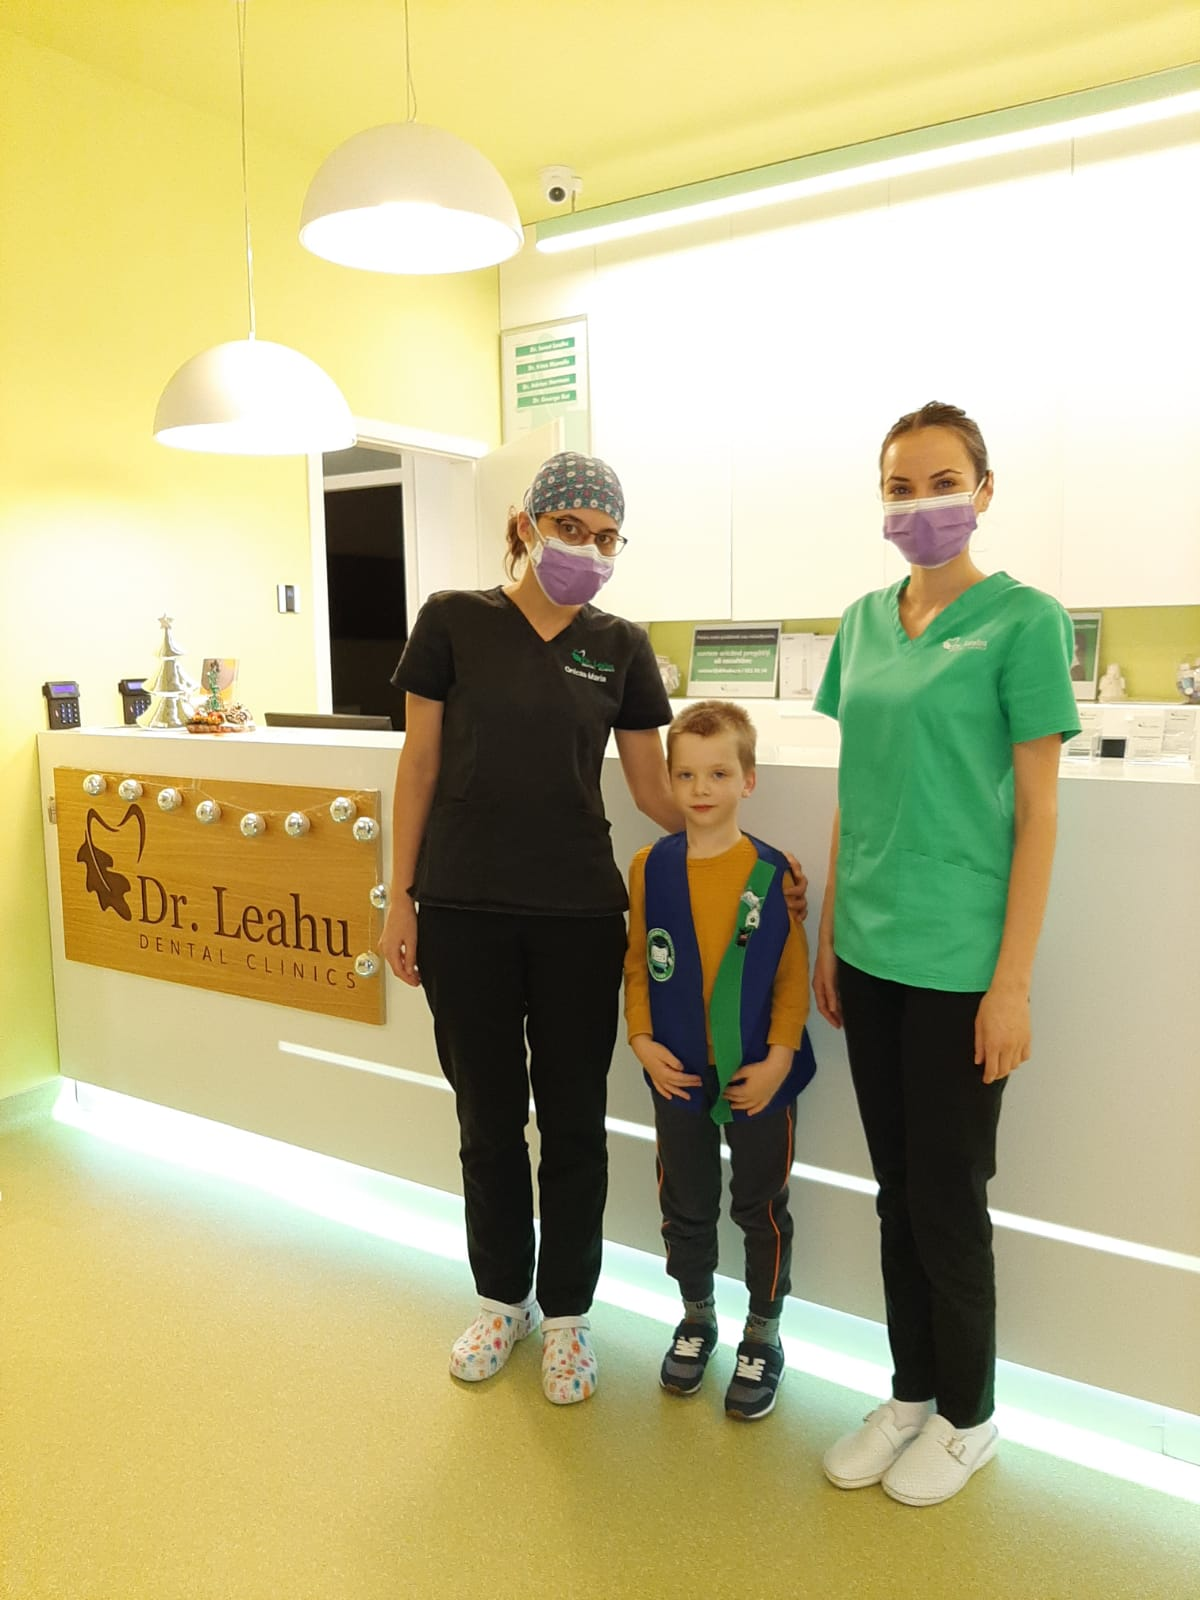 medic dentist in stanga, pacient in centru, asistent medical in dreapta